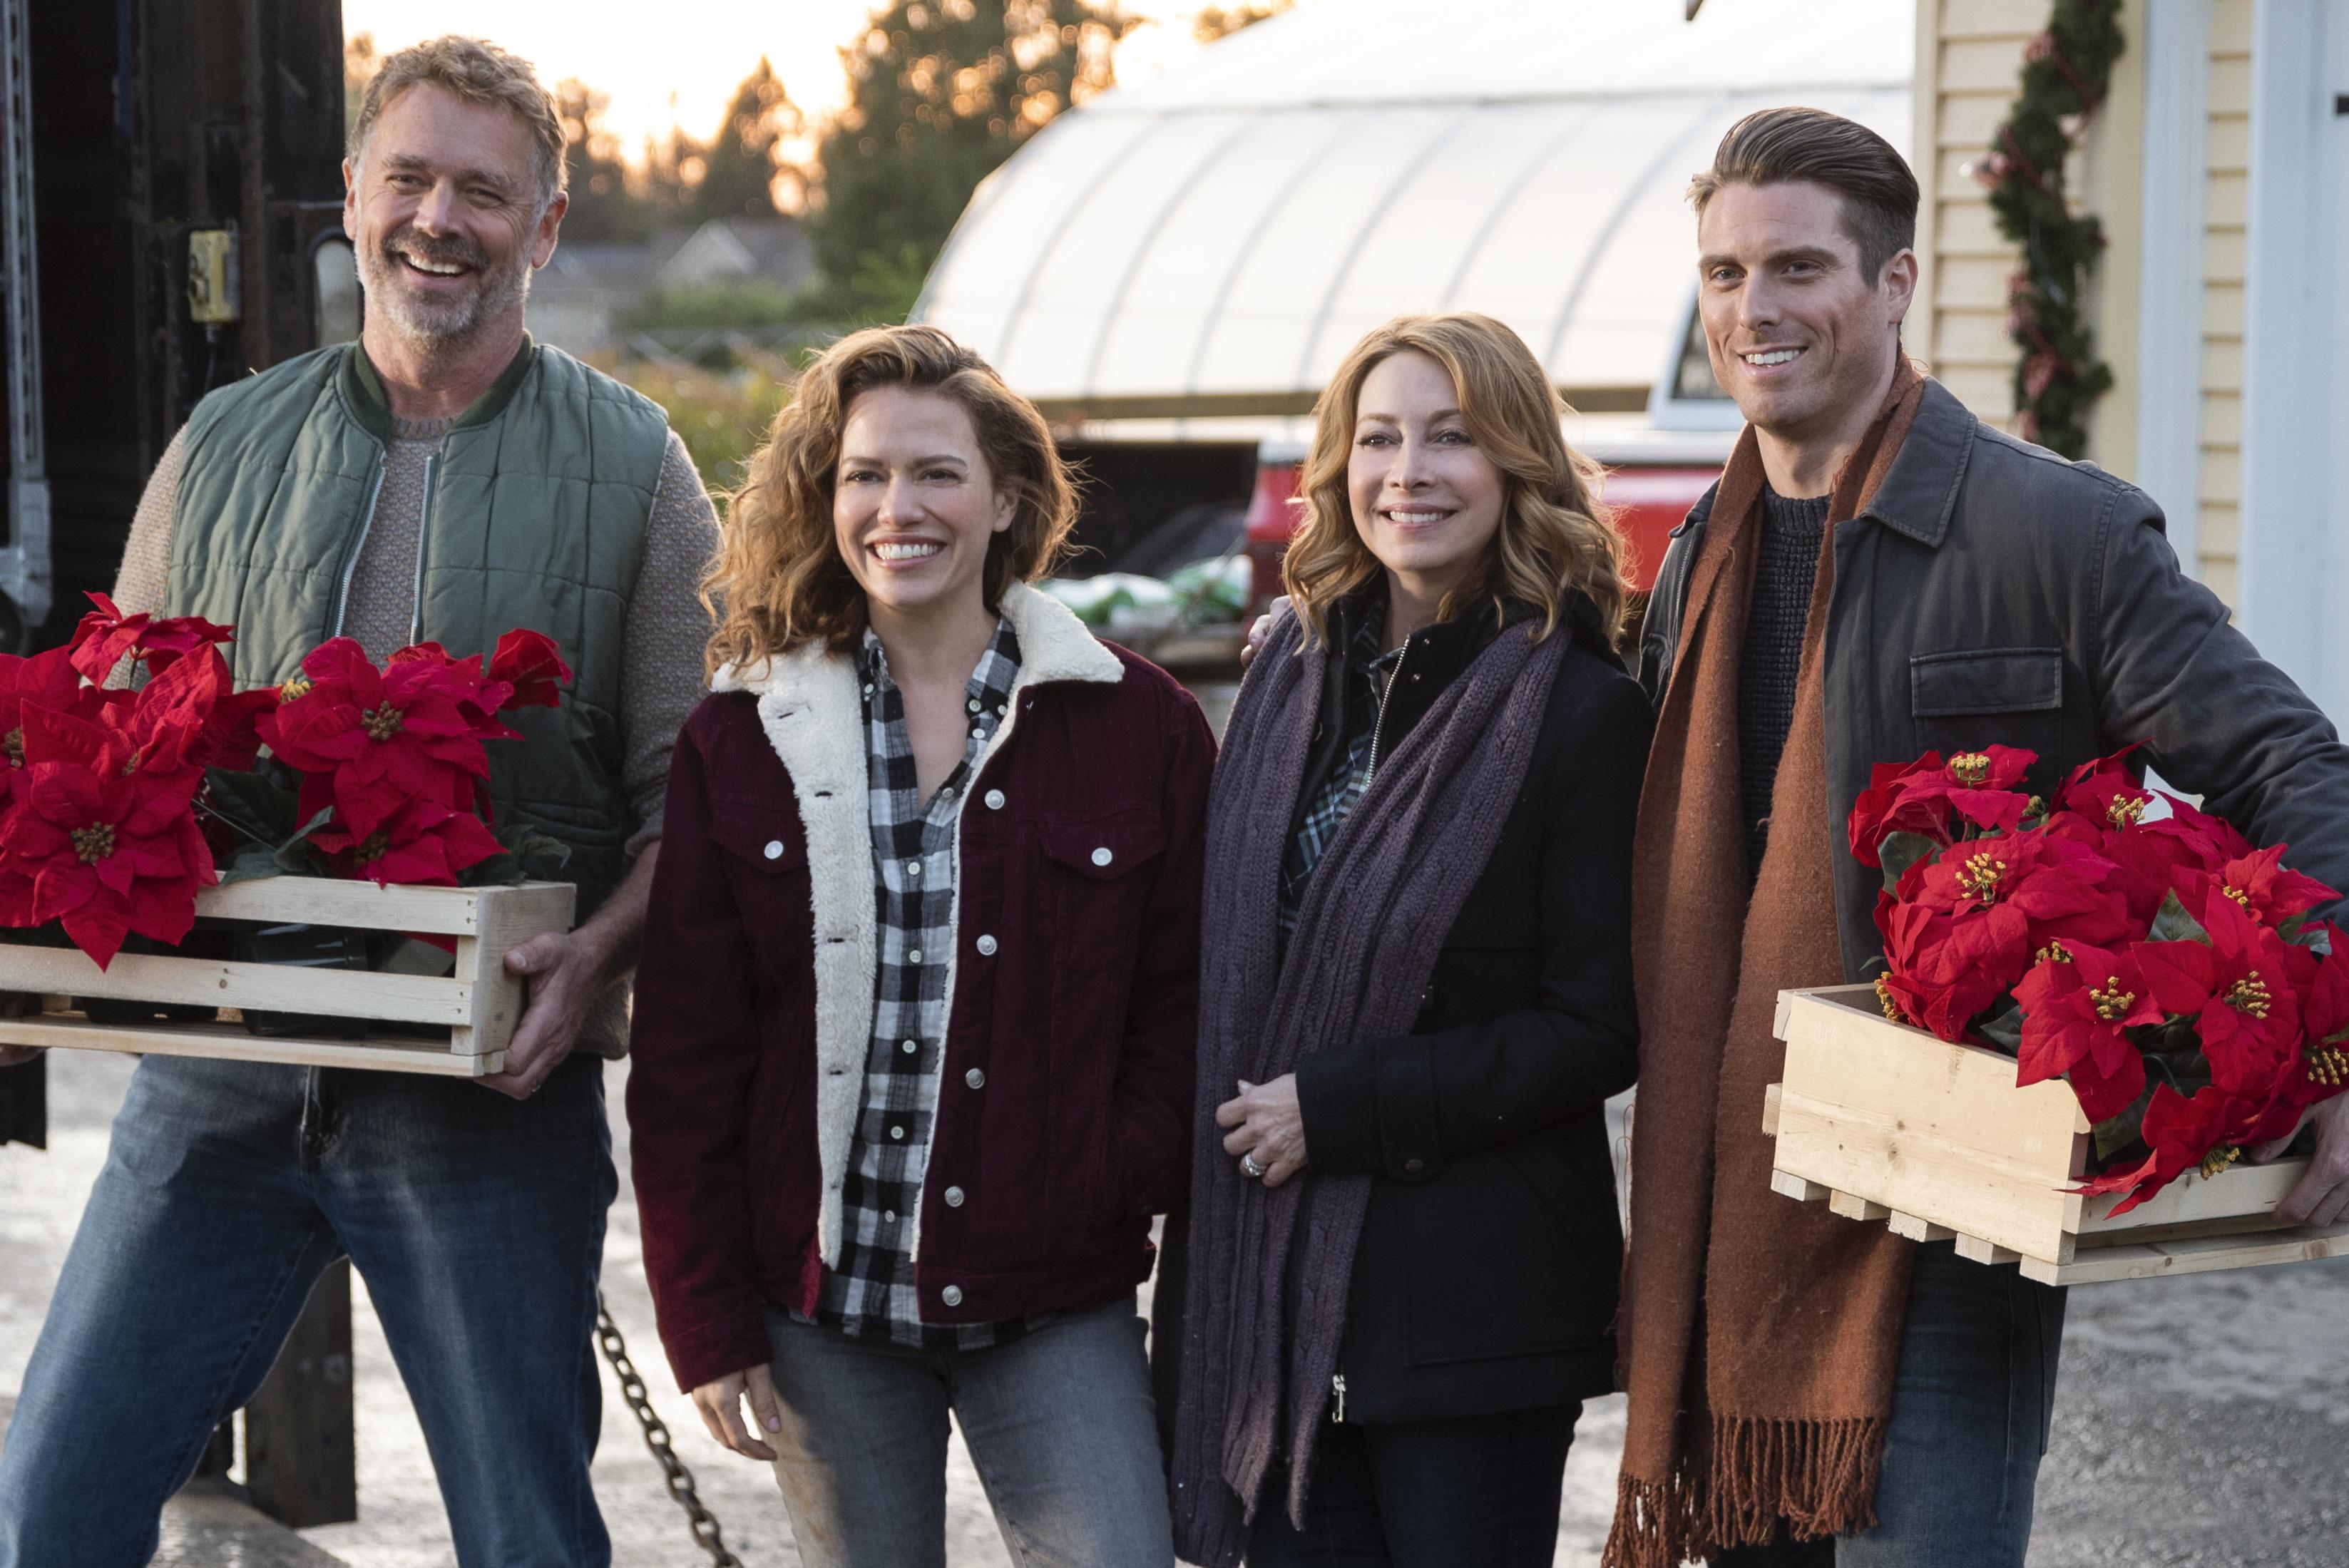 Cast of 'Poinsettias for Christmas'